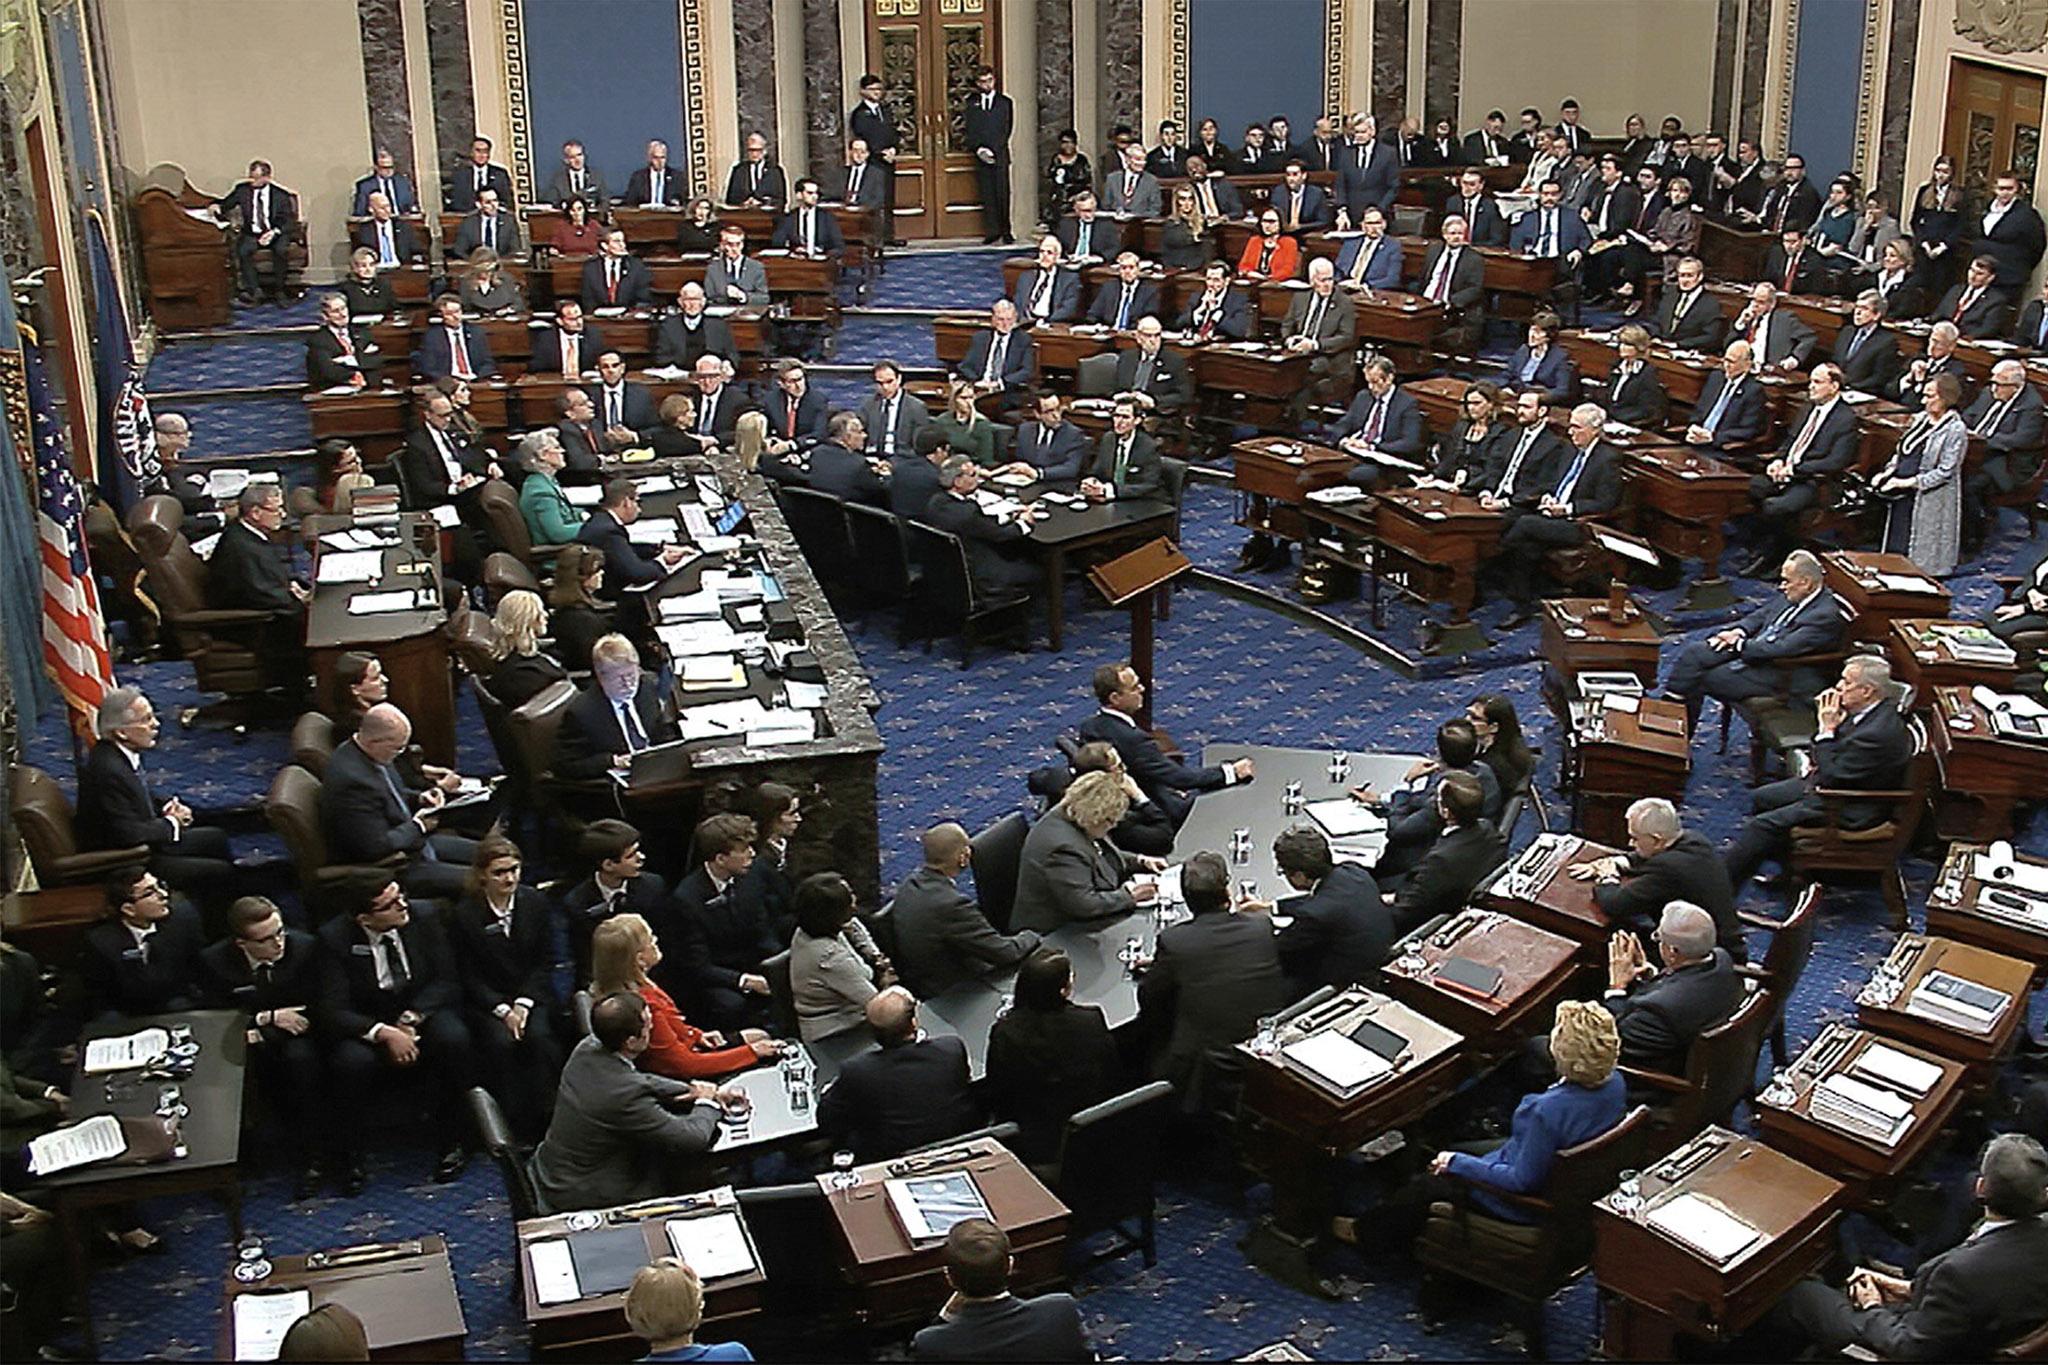 Senators vote on the first article of impeachment in Trump's 2020 trial